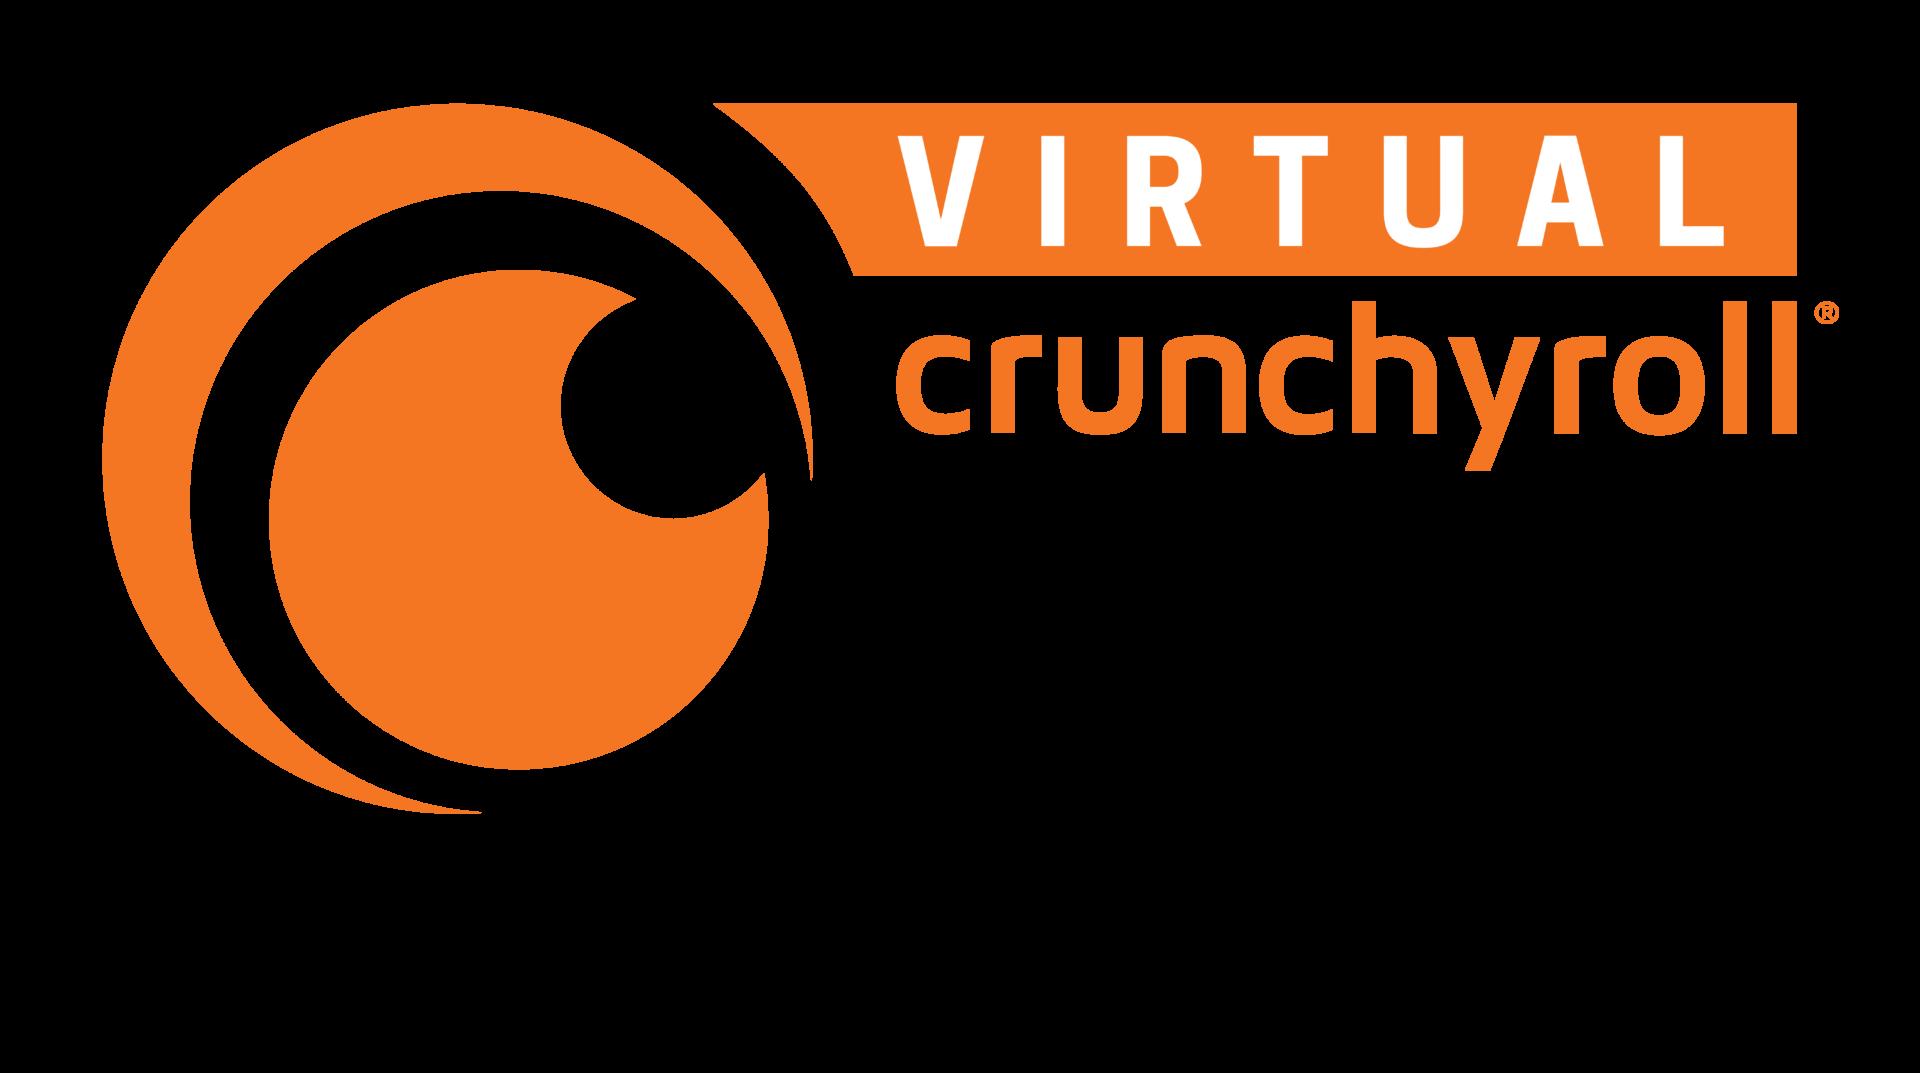 Virtual Crunchyroll Expo